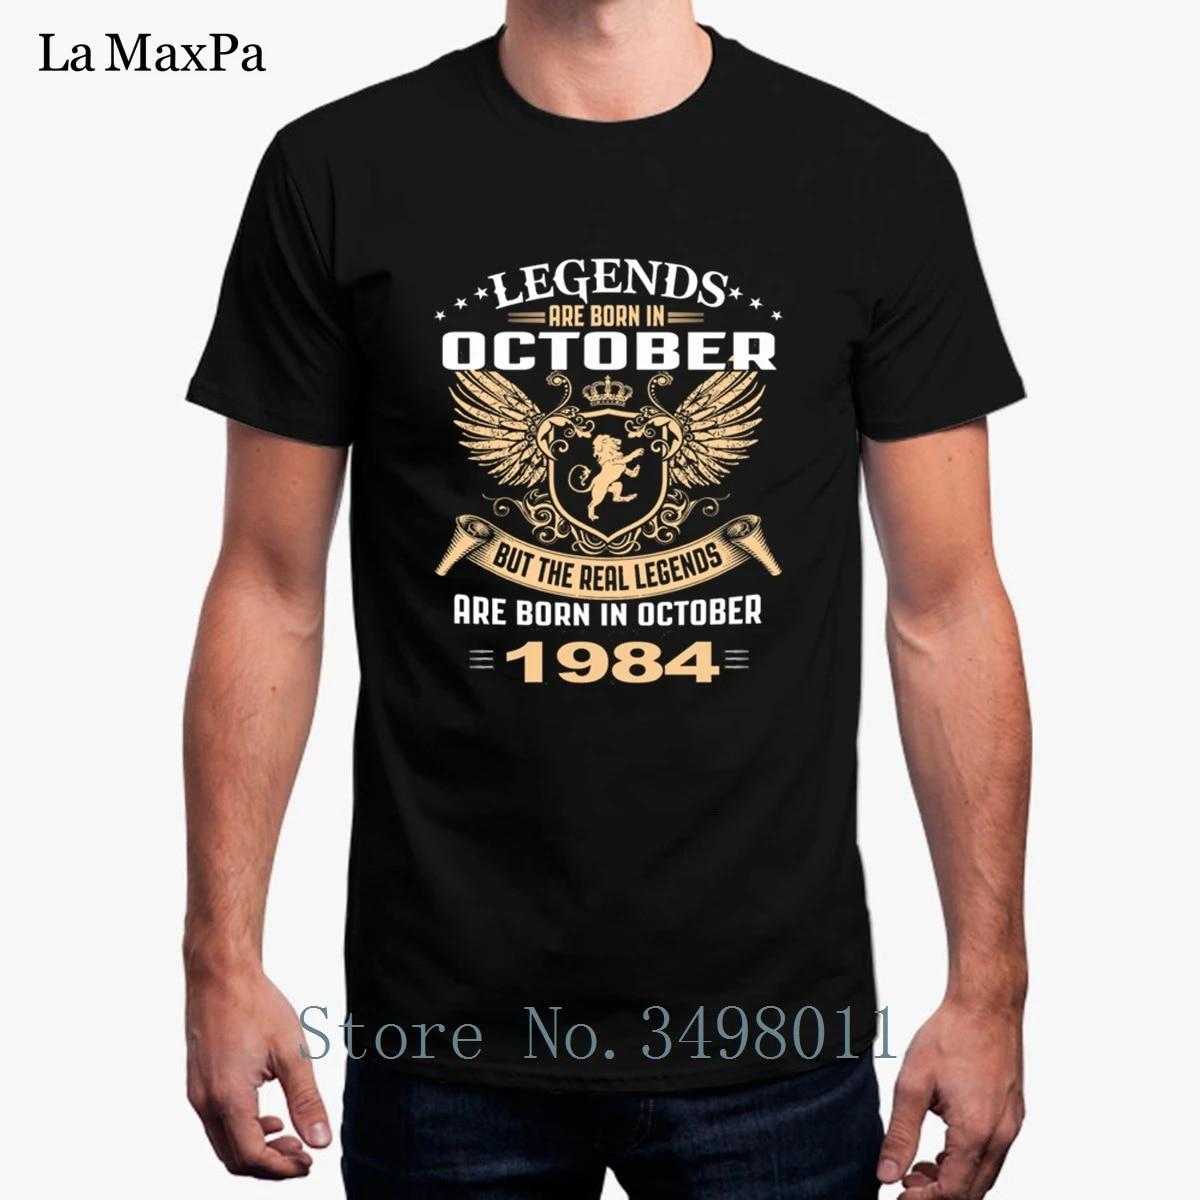 Camiseta Barata Para Hombre Camiseta Legends Are Born In October 1984 Camiseta Unisex De Cuello Redondo Chulas De Hombre Camisetas De Tallas Grandes Para Hombre T Shirt Men T Shirtmen T Shirt Aliexpress